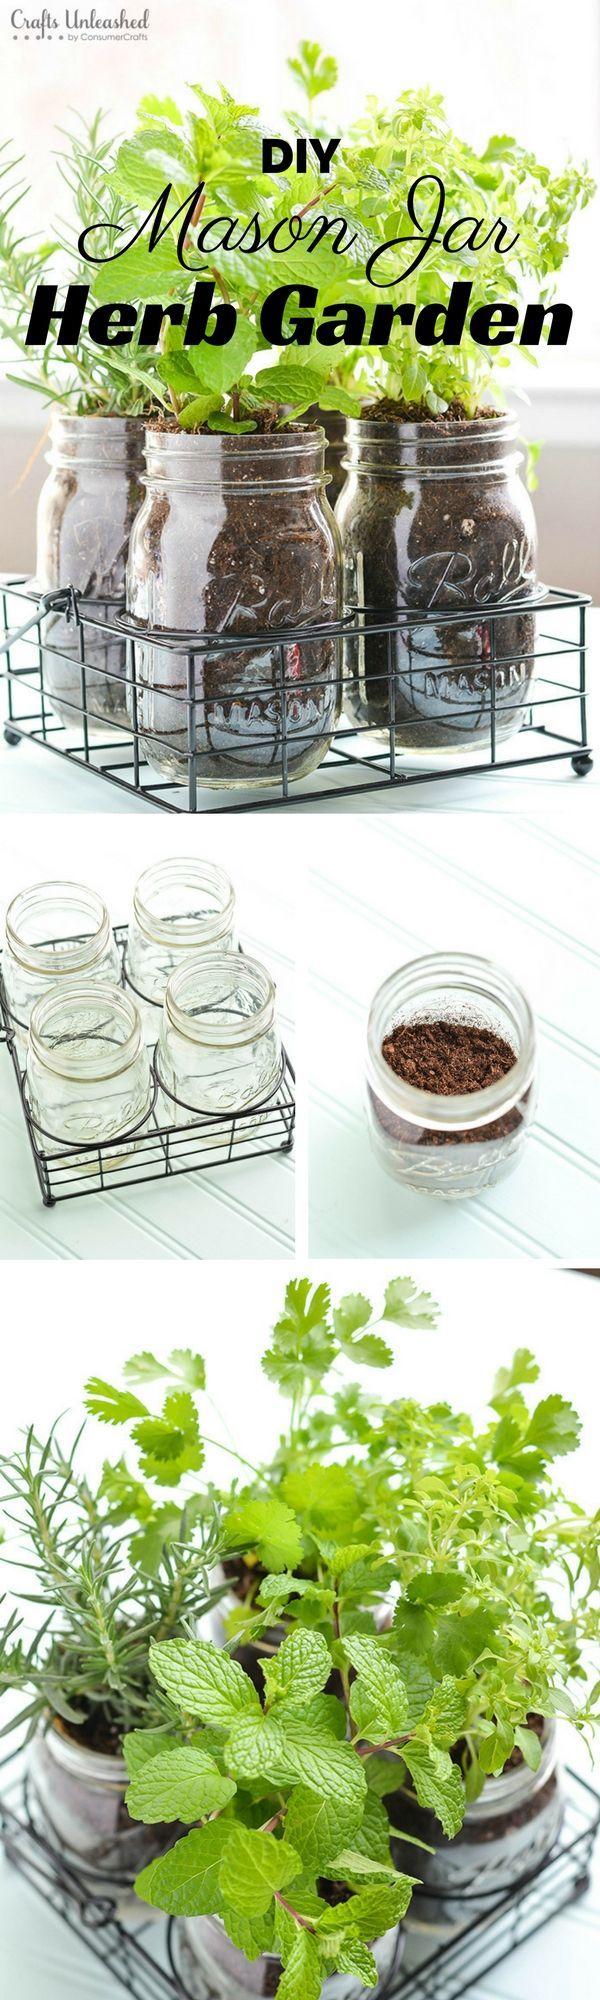 Check out the tutorial: #DIY Mason Jar Herb Garden @Industry Standard Design